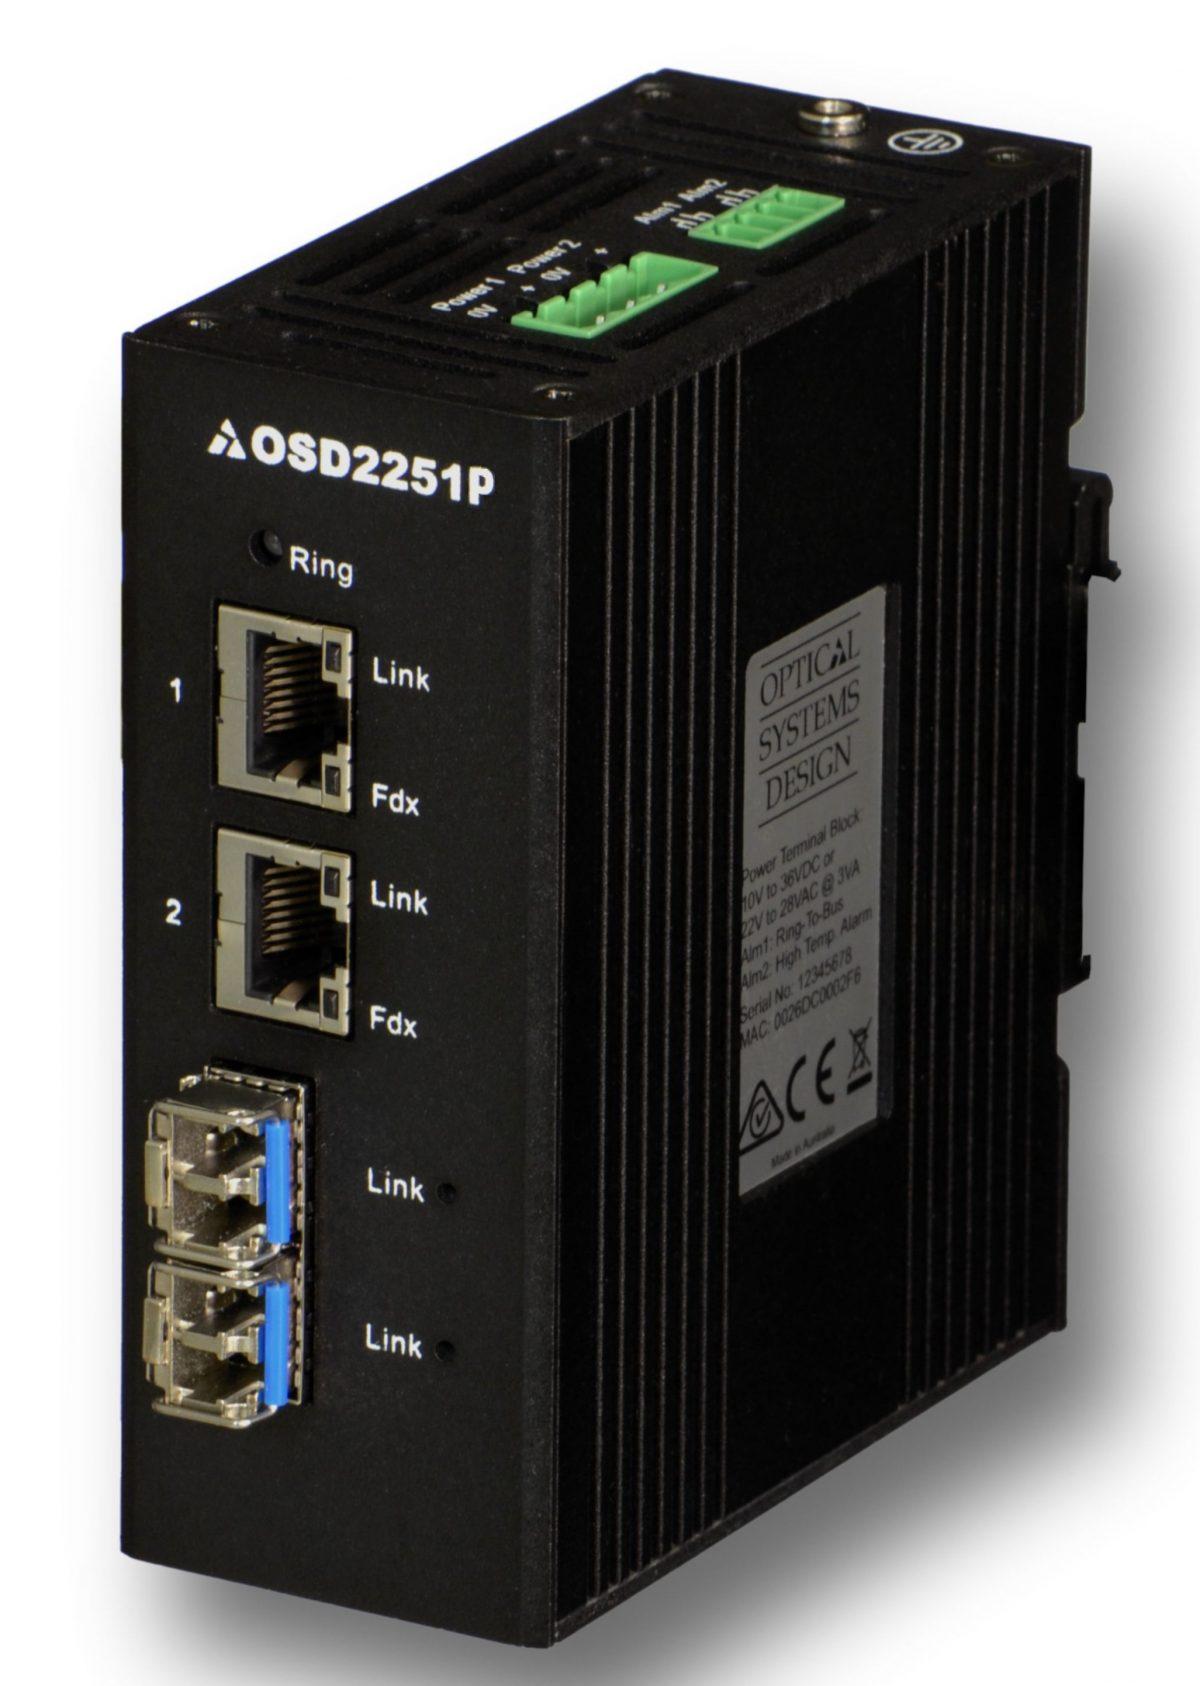 Osd2251p Self Managed Poe Ethernet Switchoptical Systems